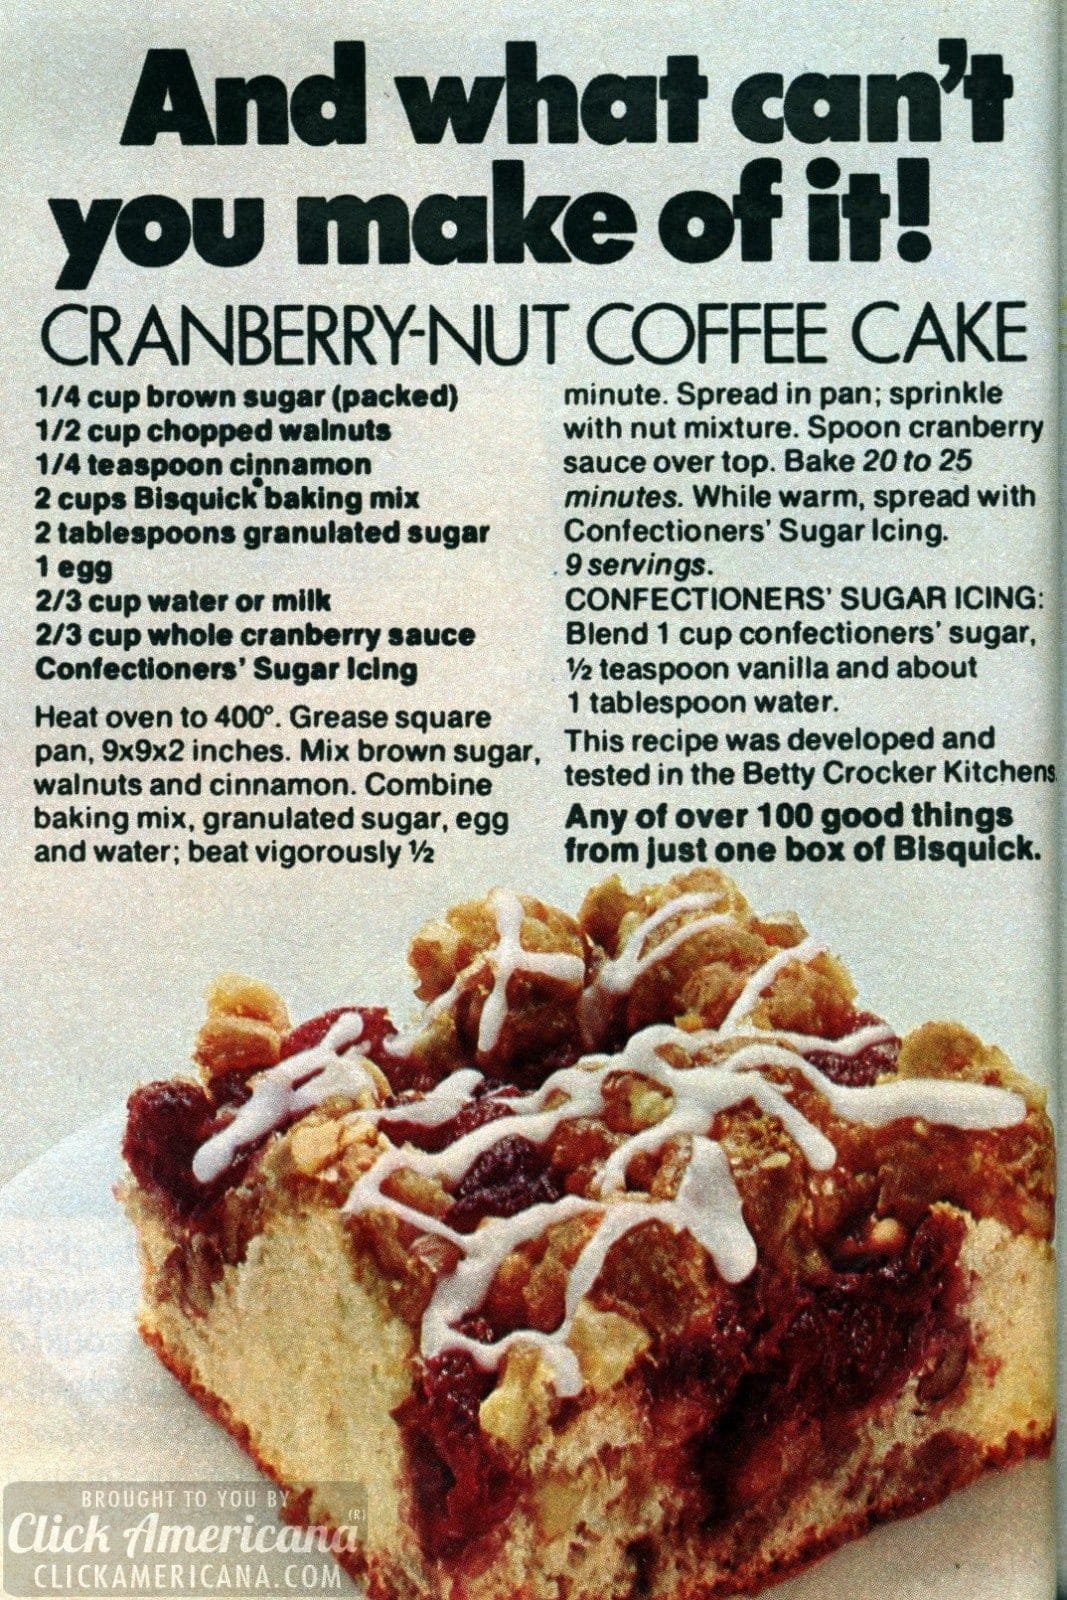 Cranberry-Nut Coffee Cake (1974)